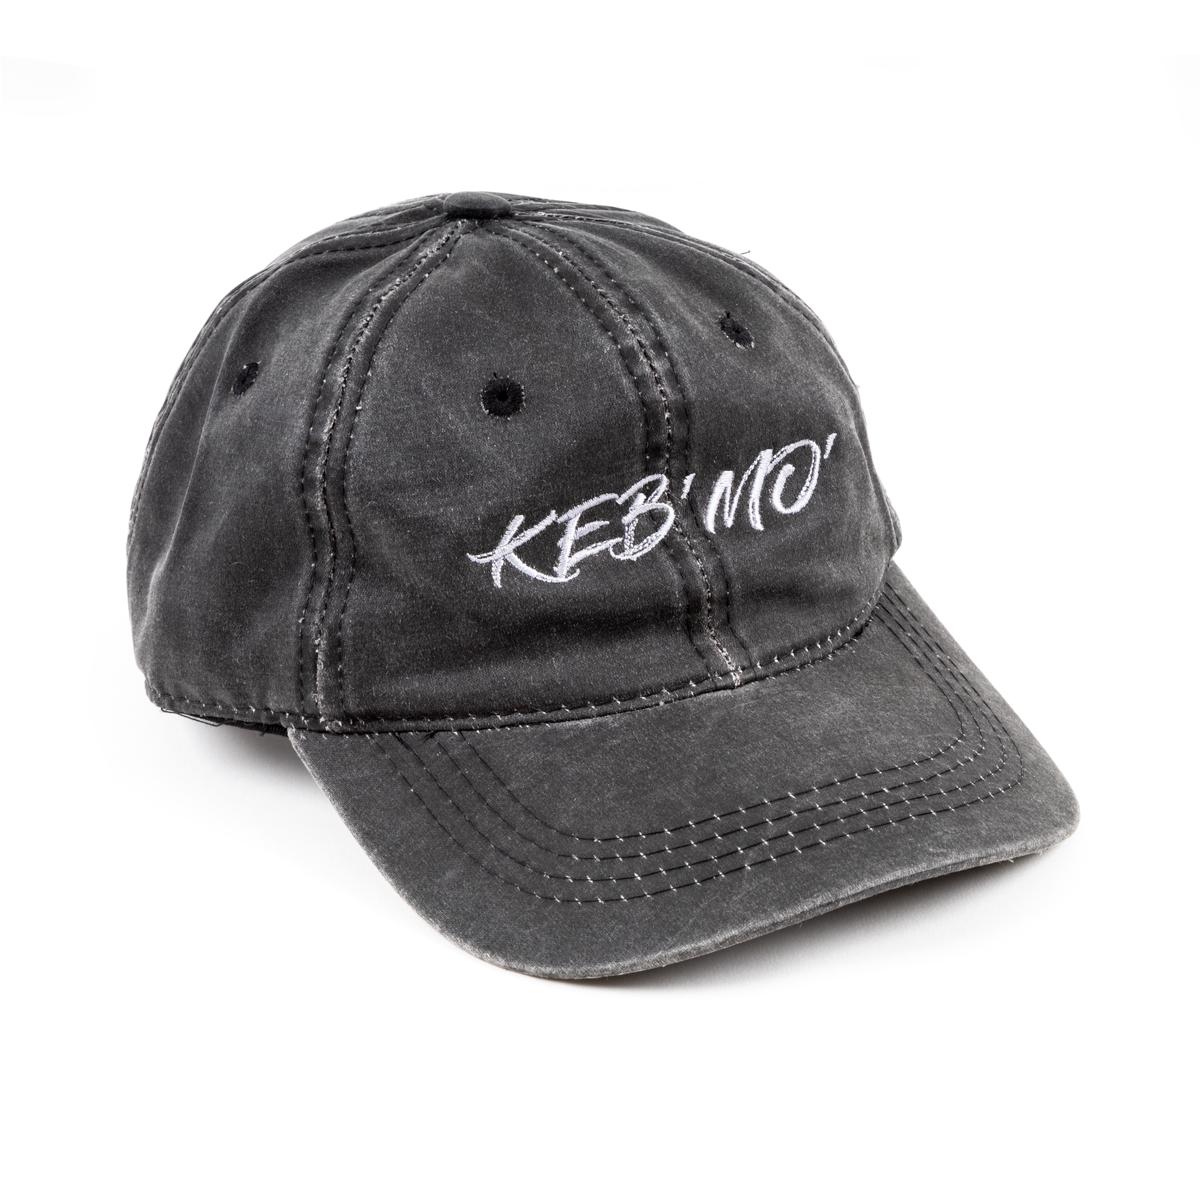 Keb' Mo' Signature Hat